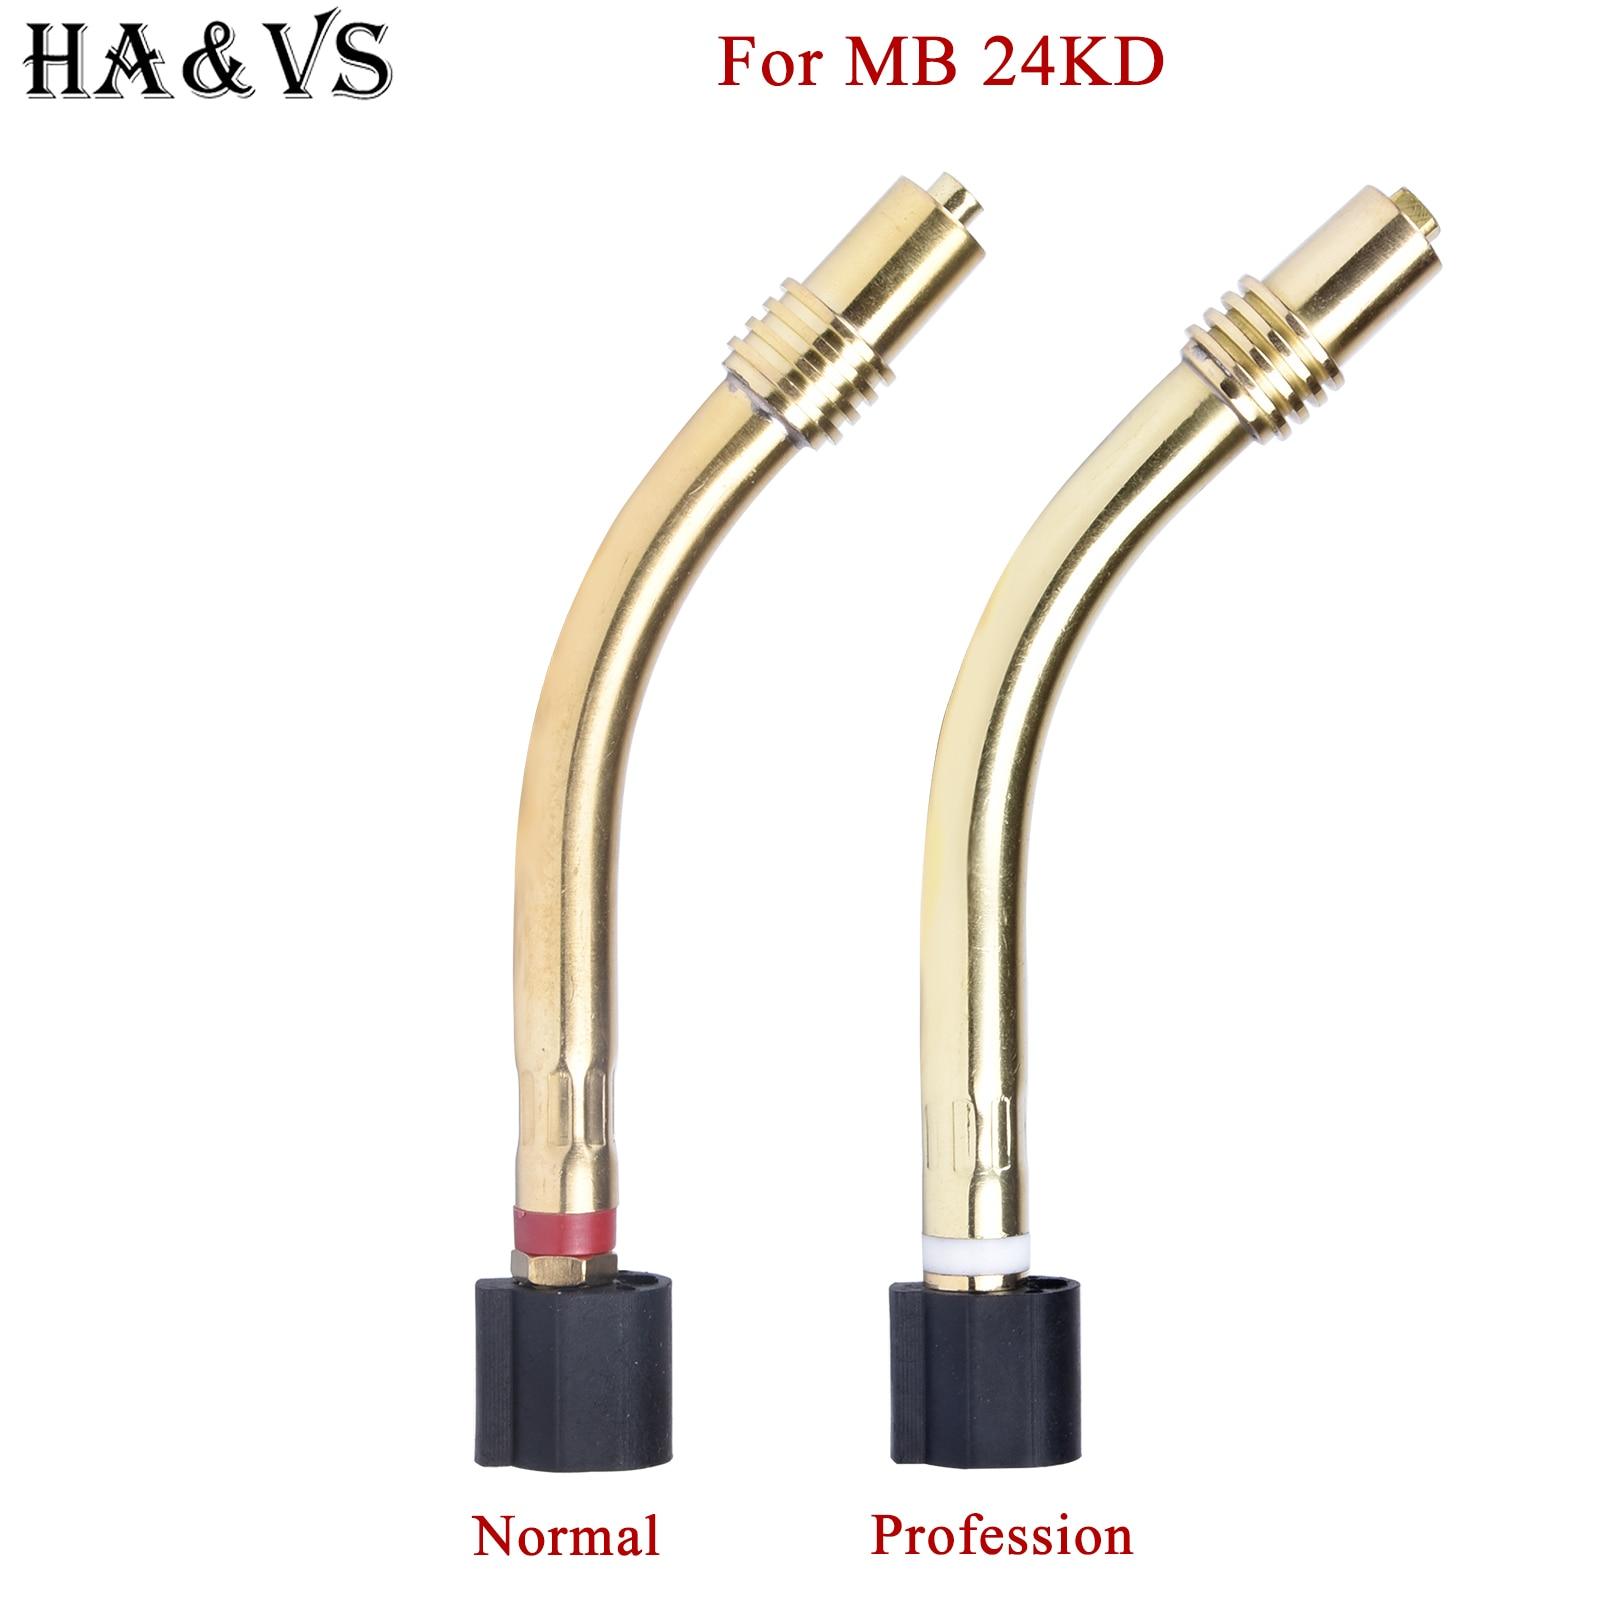 MB 24KD MIG Welding Torch SWAN NECK for Binzel Abicor Type